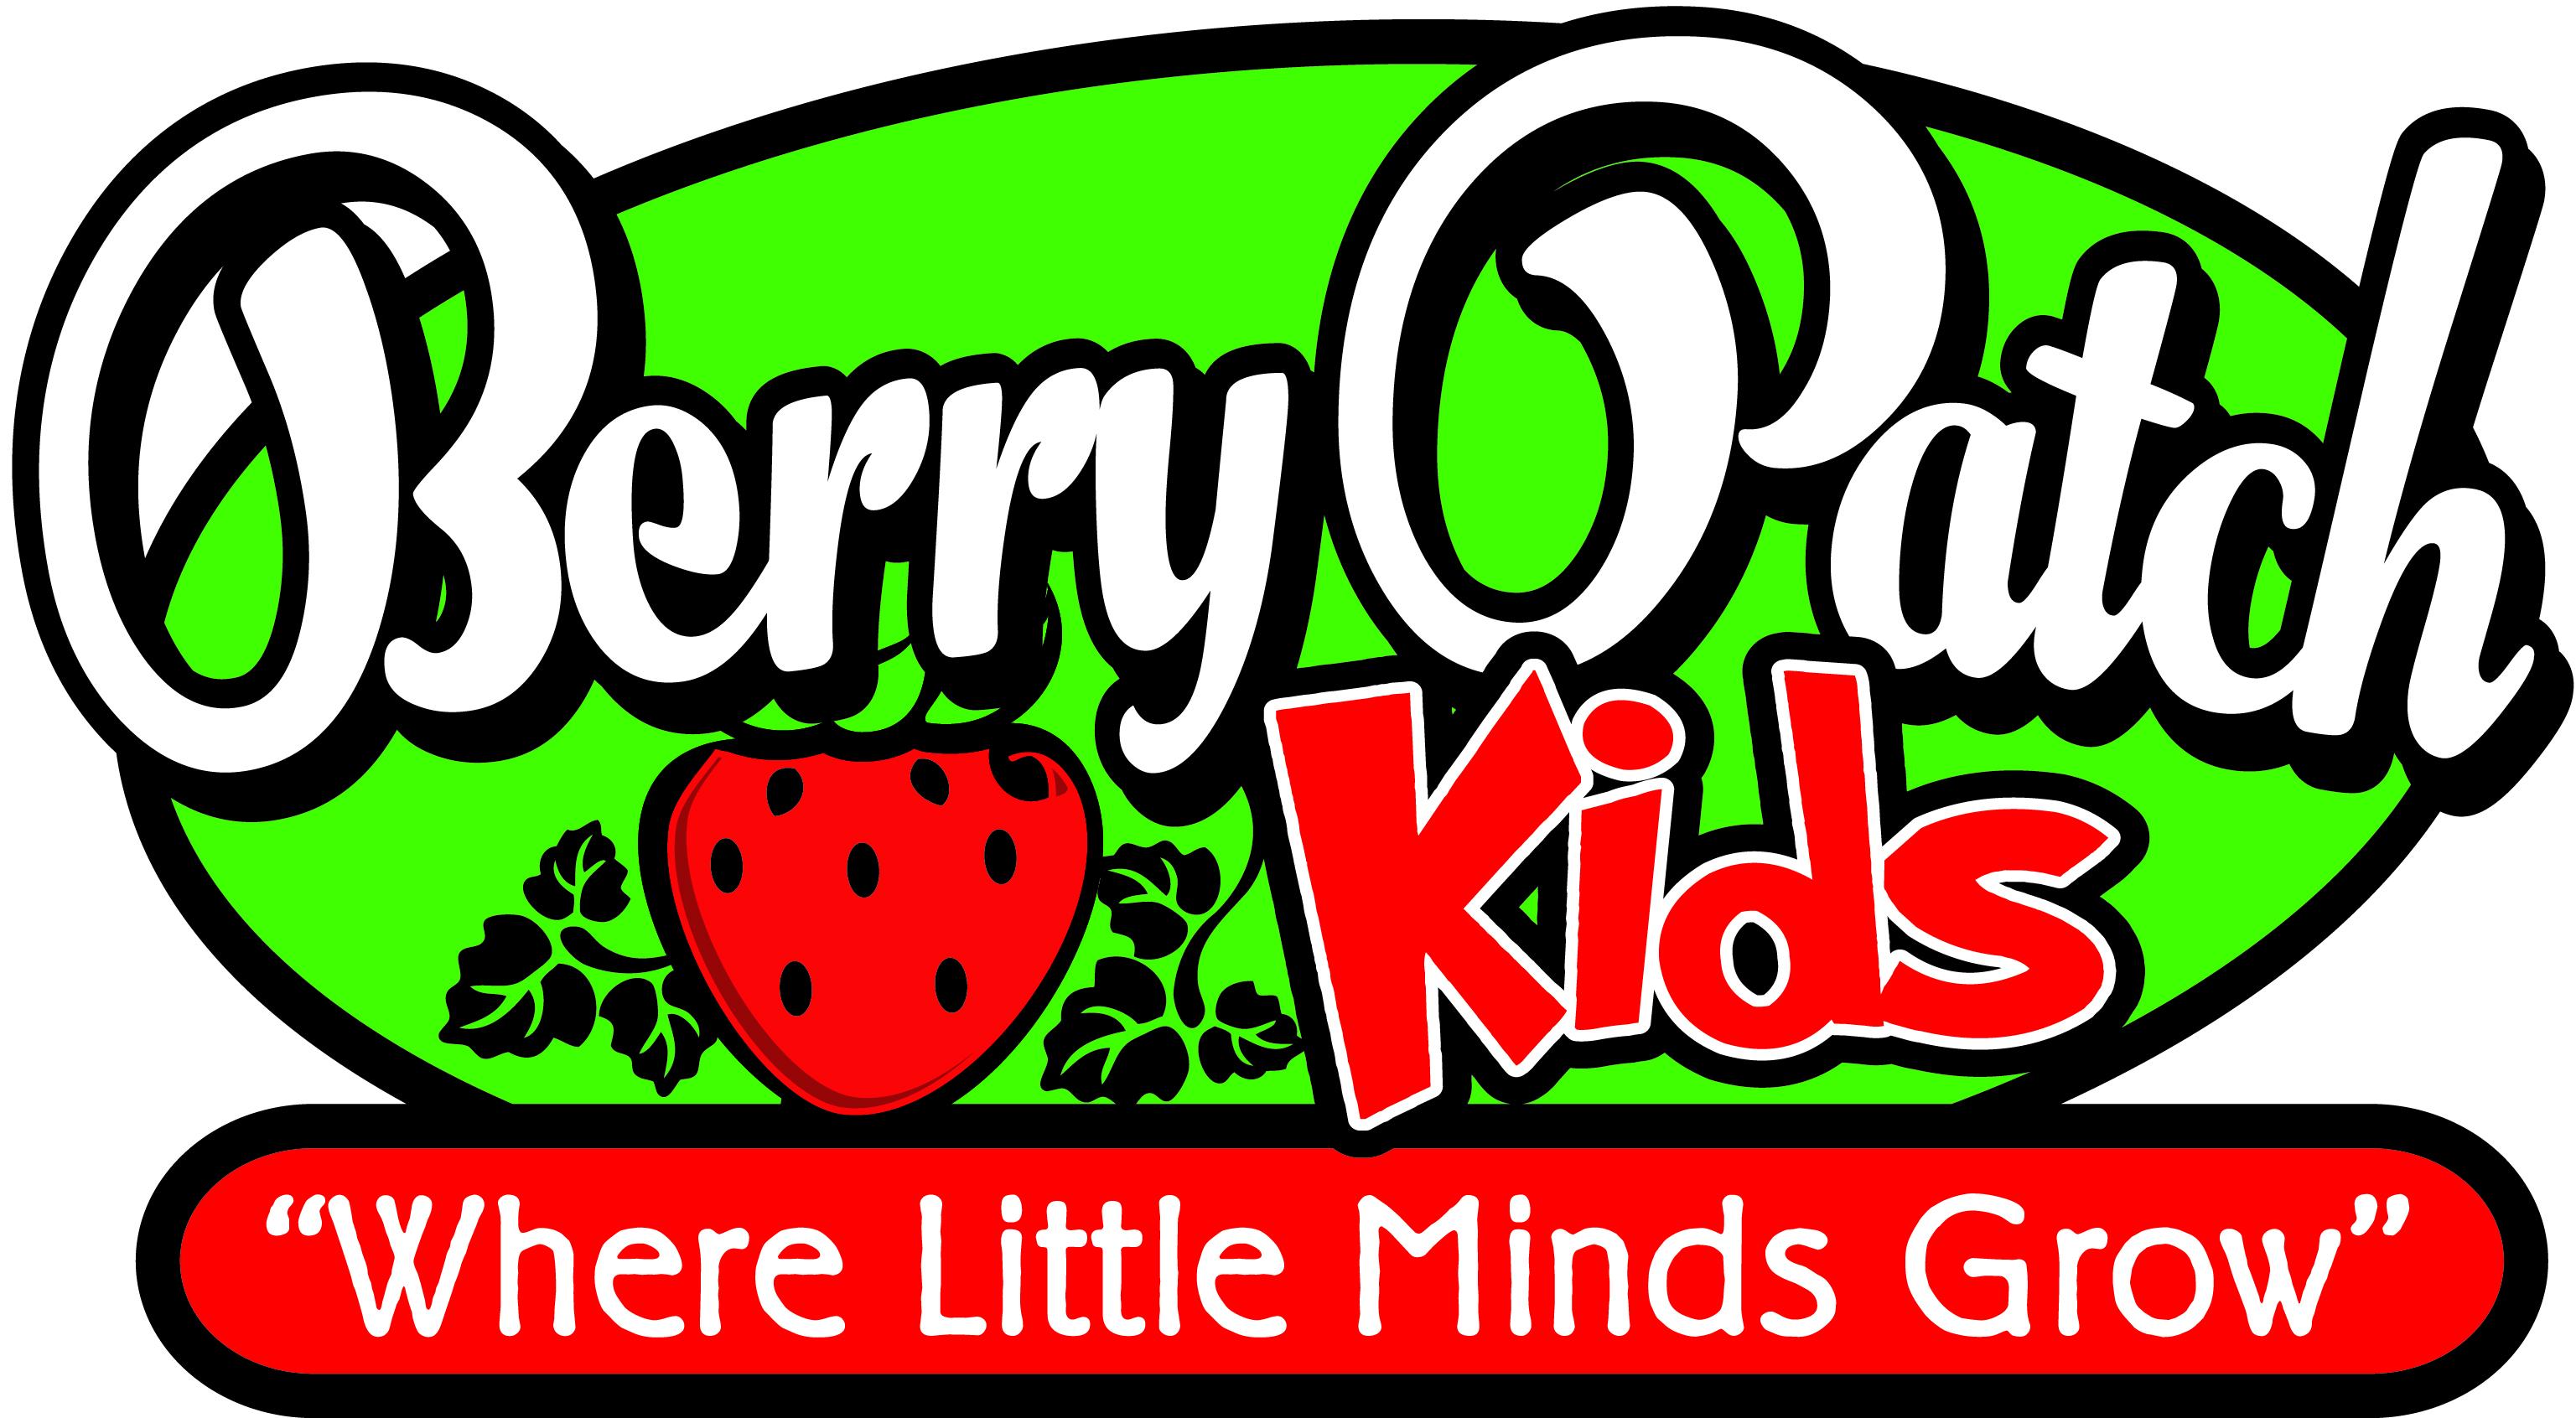 Berry Patch Kids